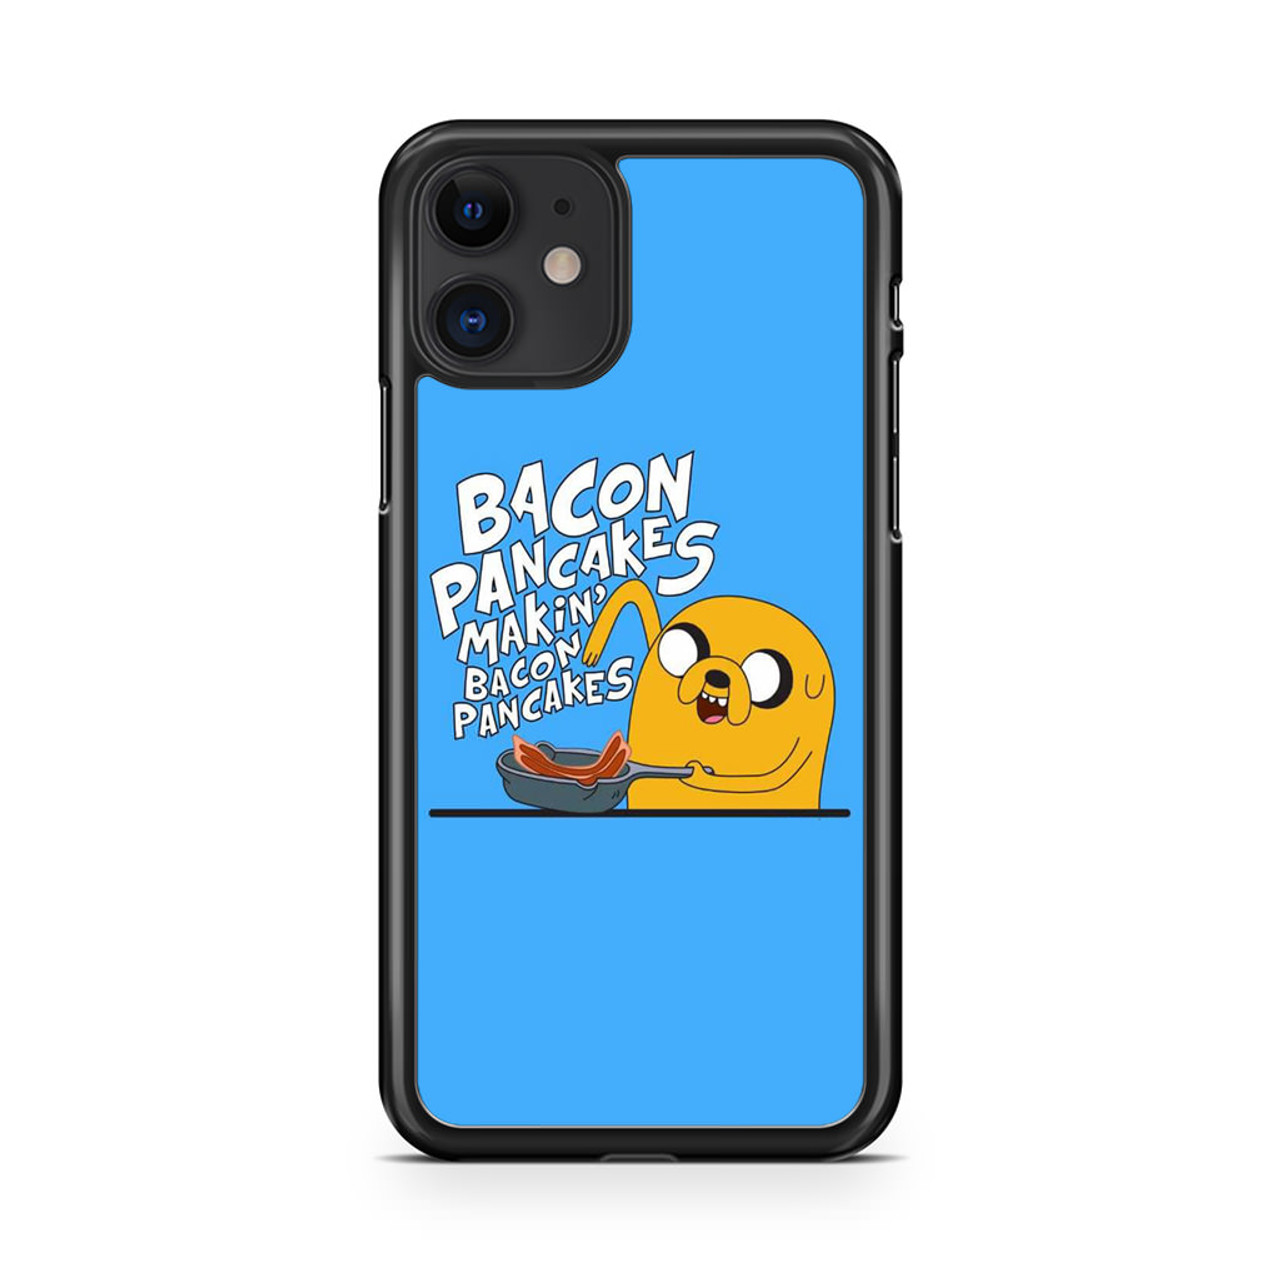 Pancakes Pattern - Blue iPhone 11 case